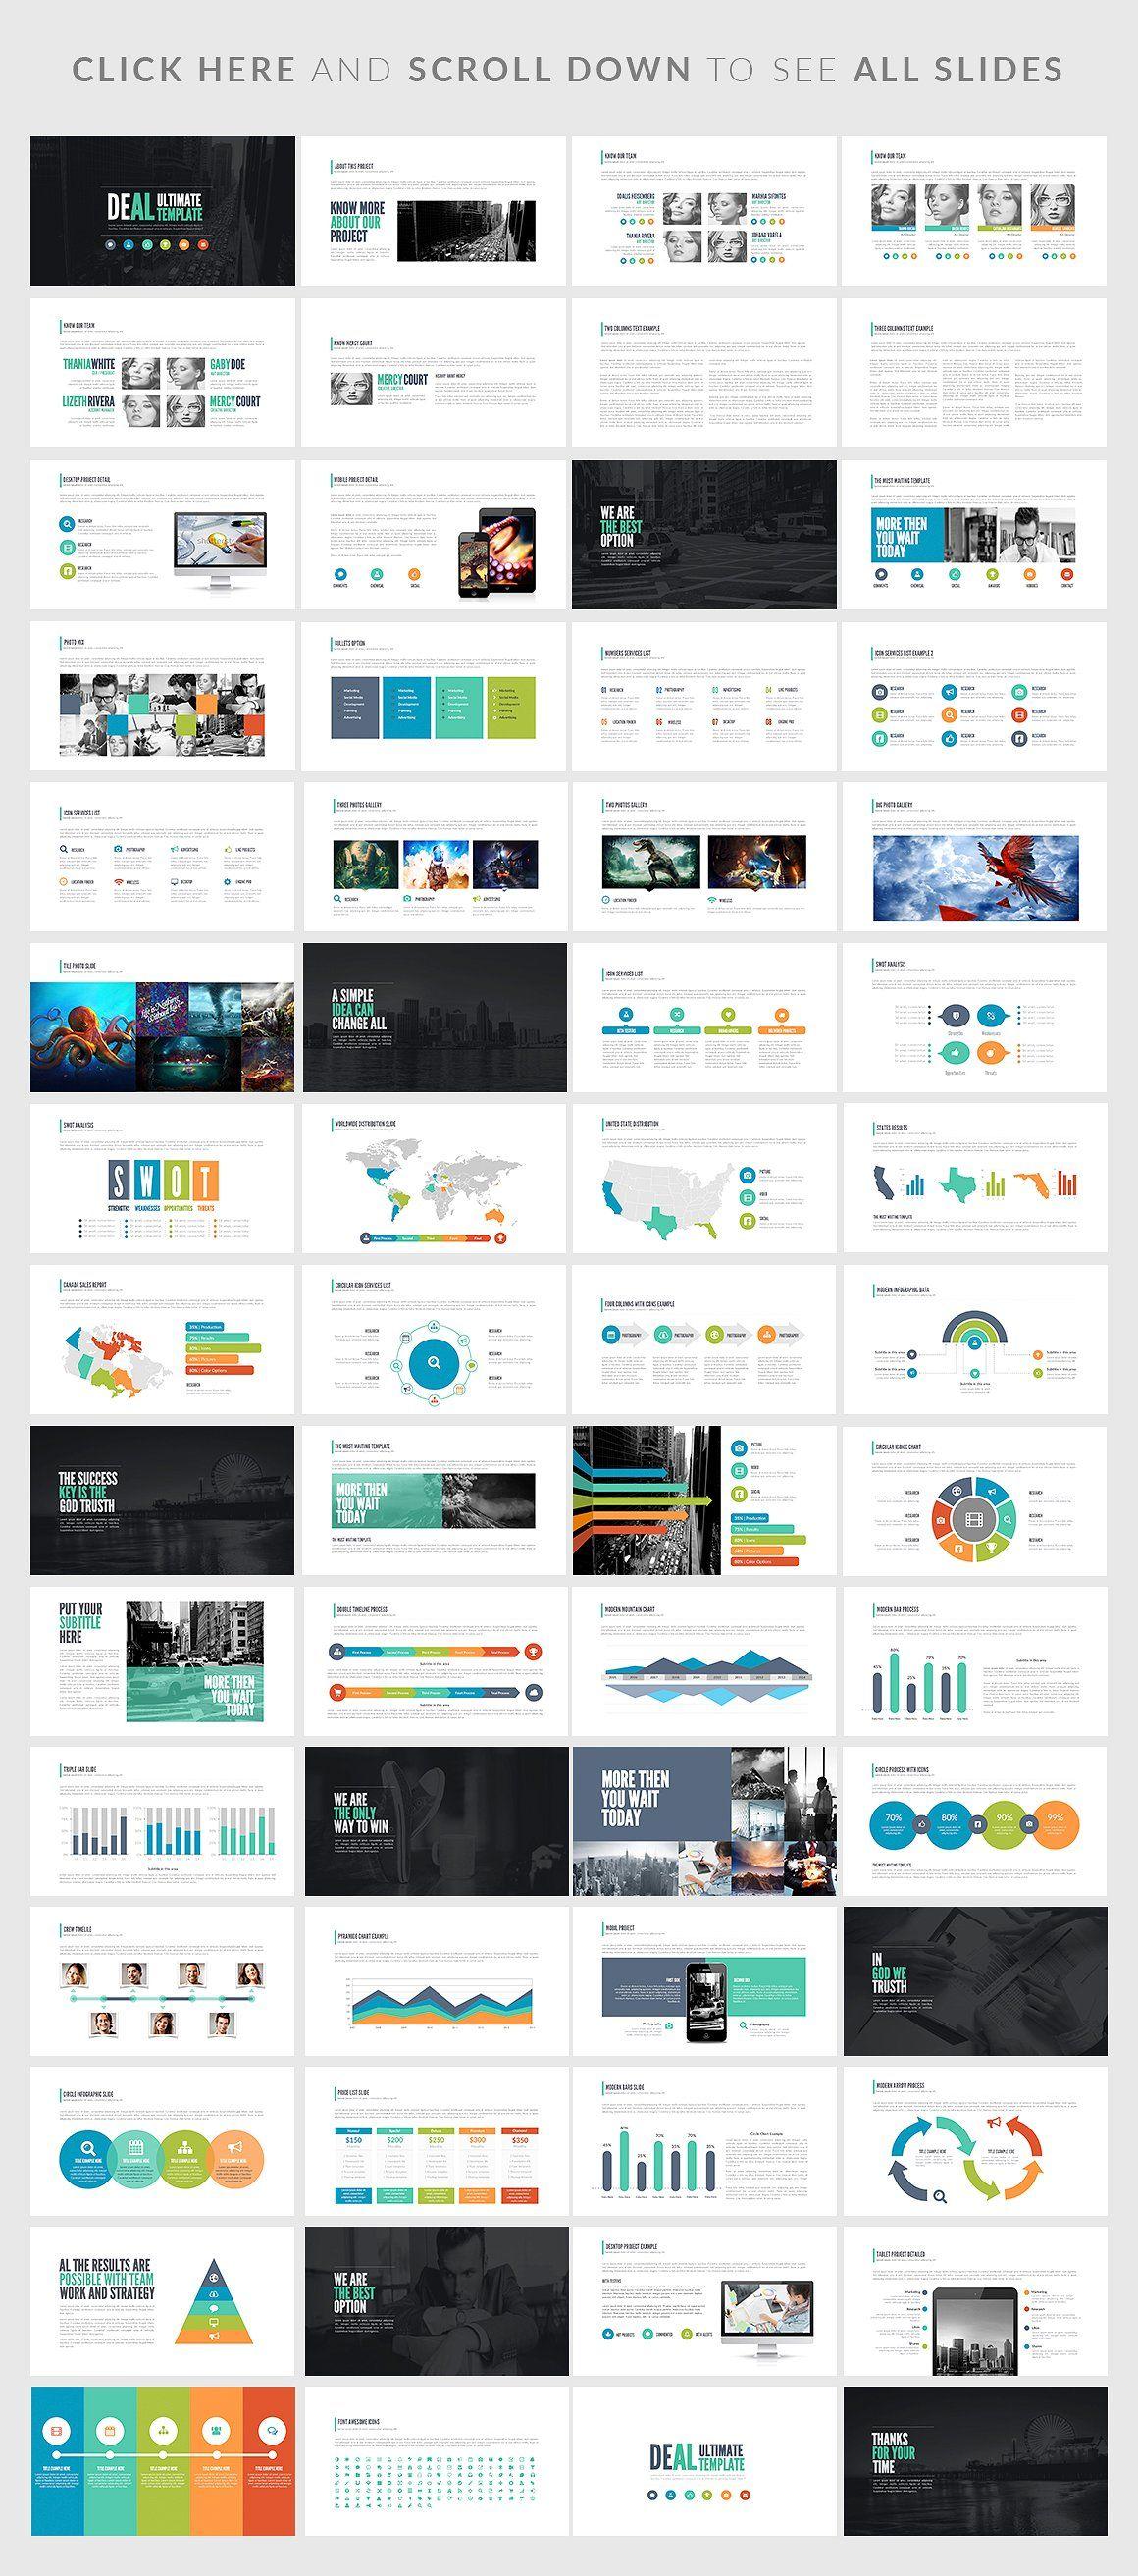 Deal Powerpoint Presentation Gestao De Projetos Apresentation